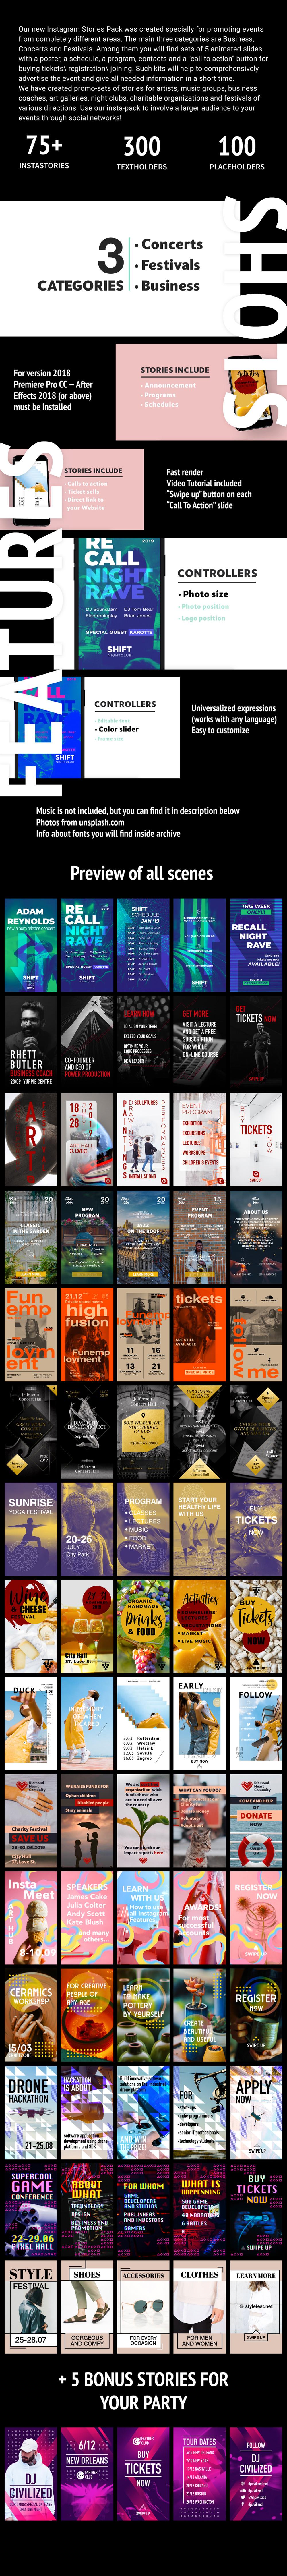 75 Insta Event Promo Stories - 1